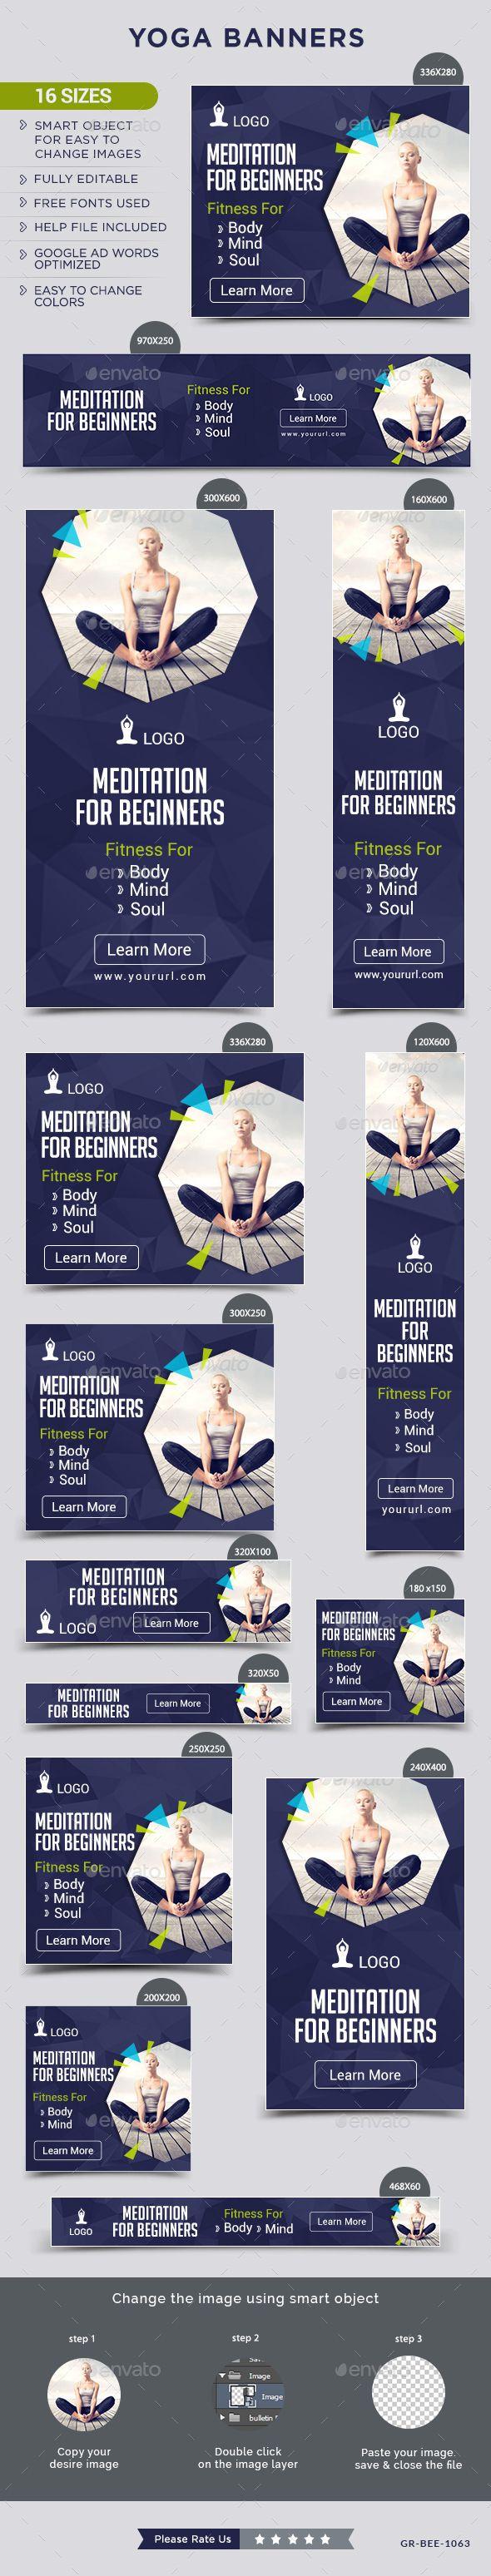 Yoga Banners Pull Up Banner Design Banner Banner Ads